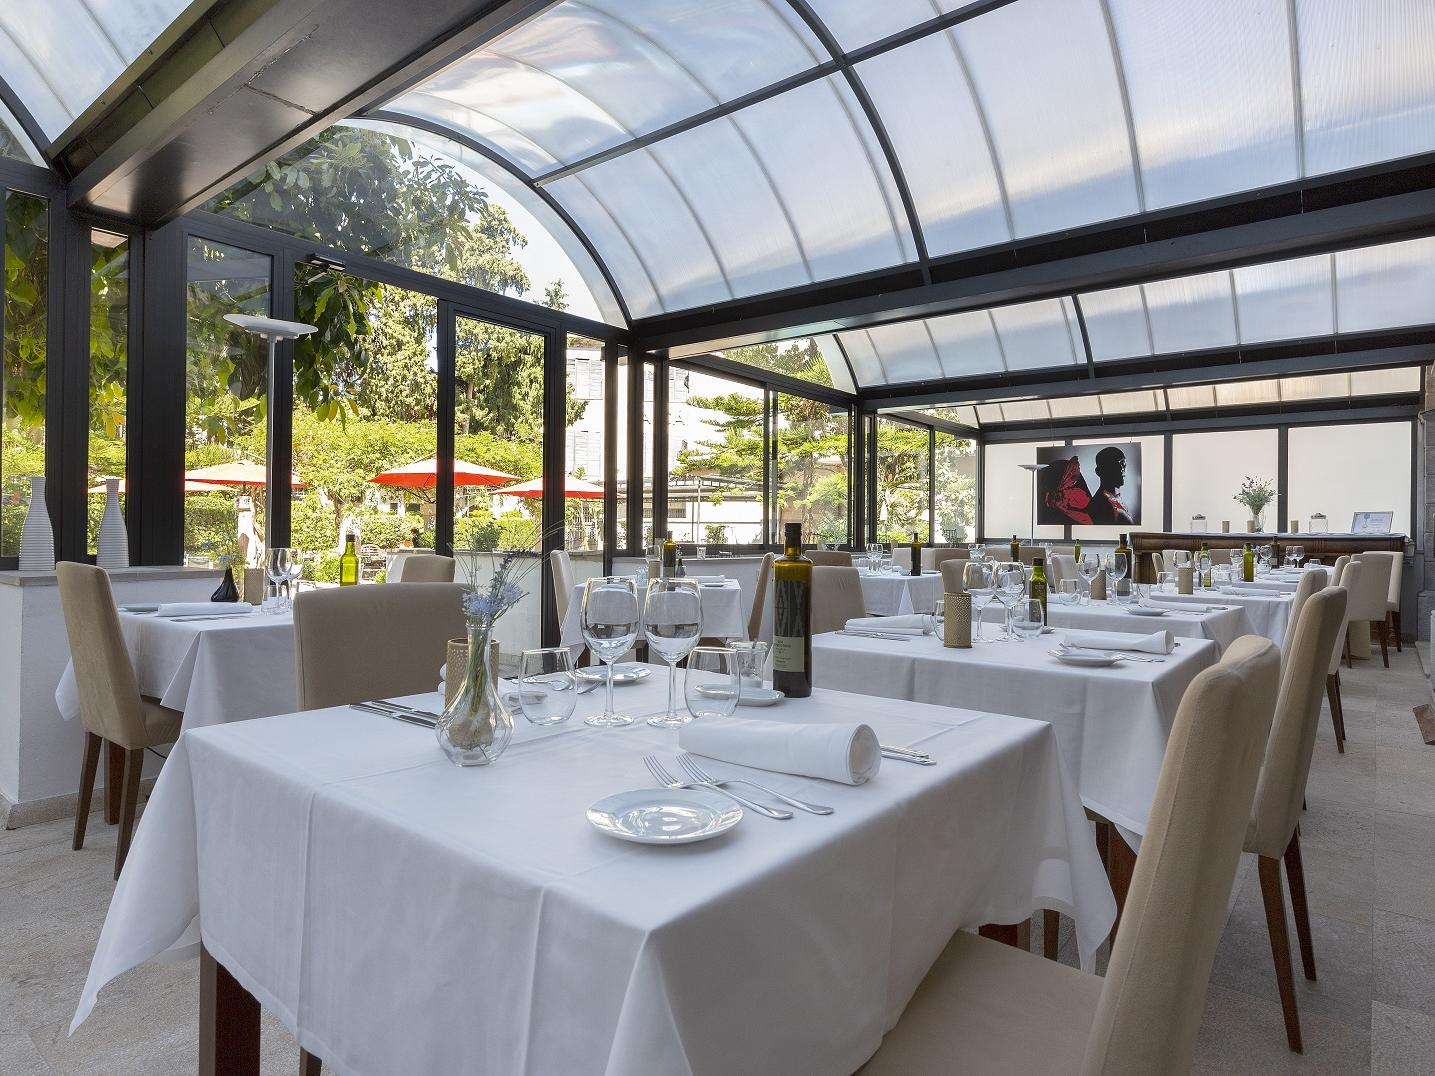 À la carte restaurant at Gran Hotel Sóller in Sóller, Majorca